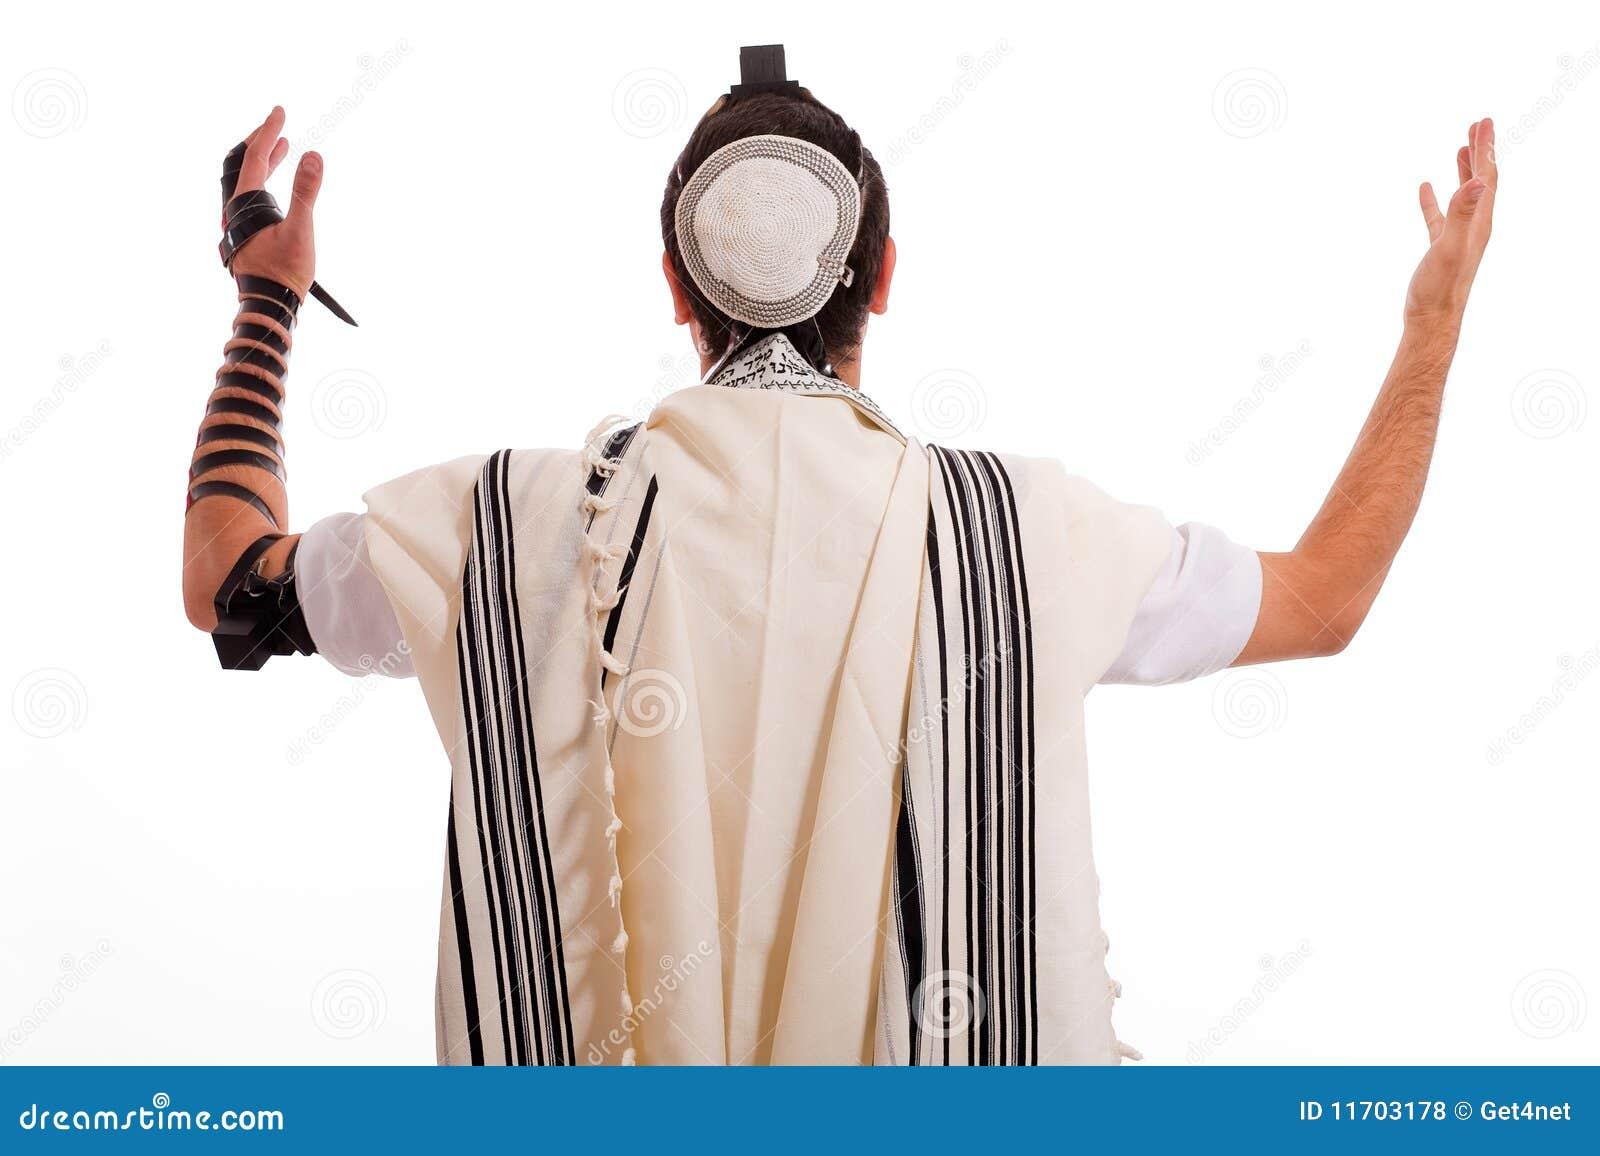 Christian dating uomo ebreo